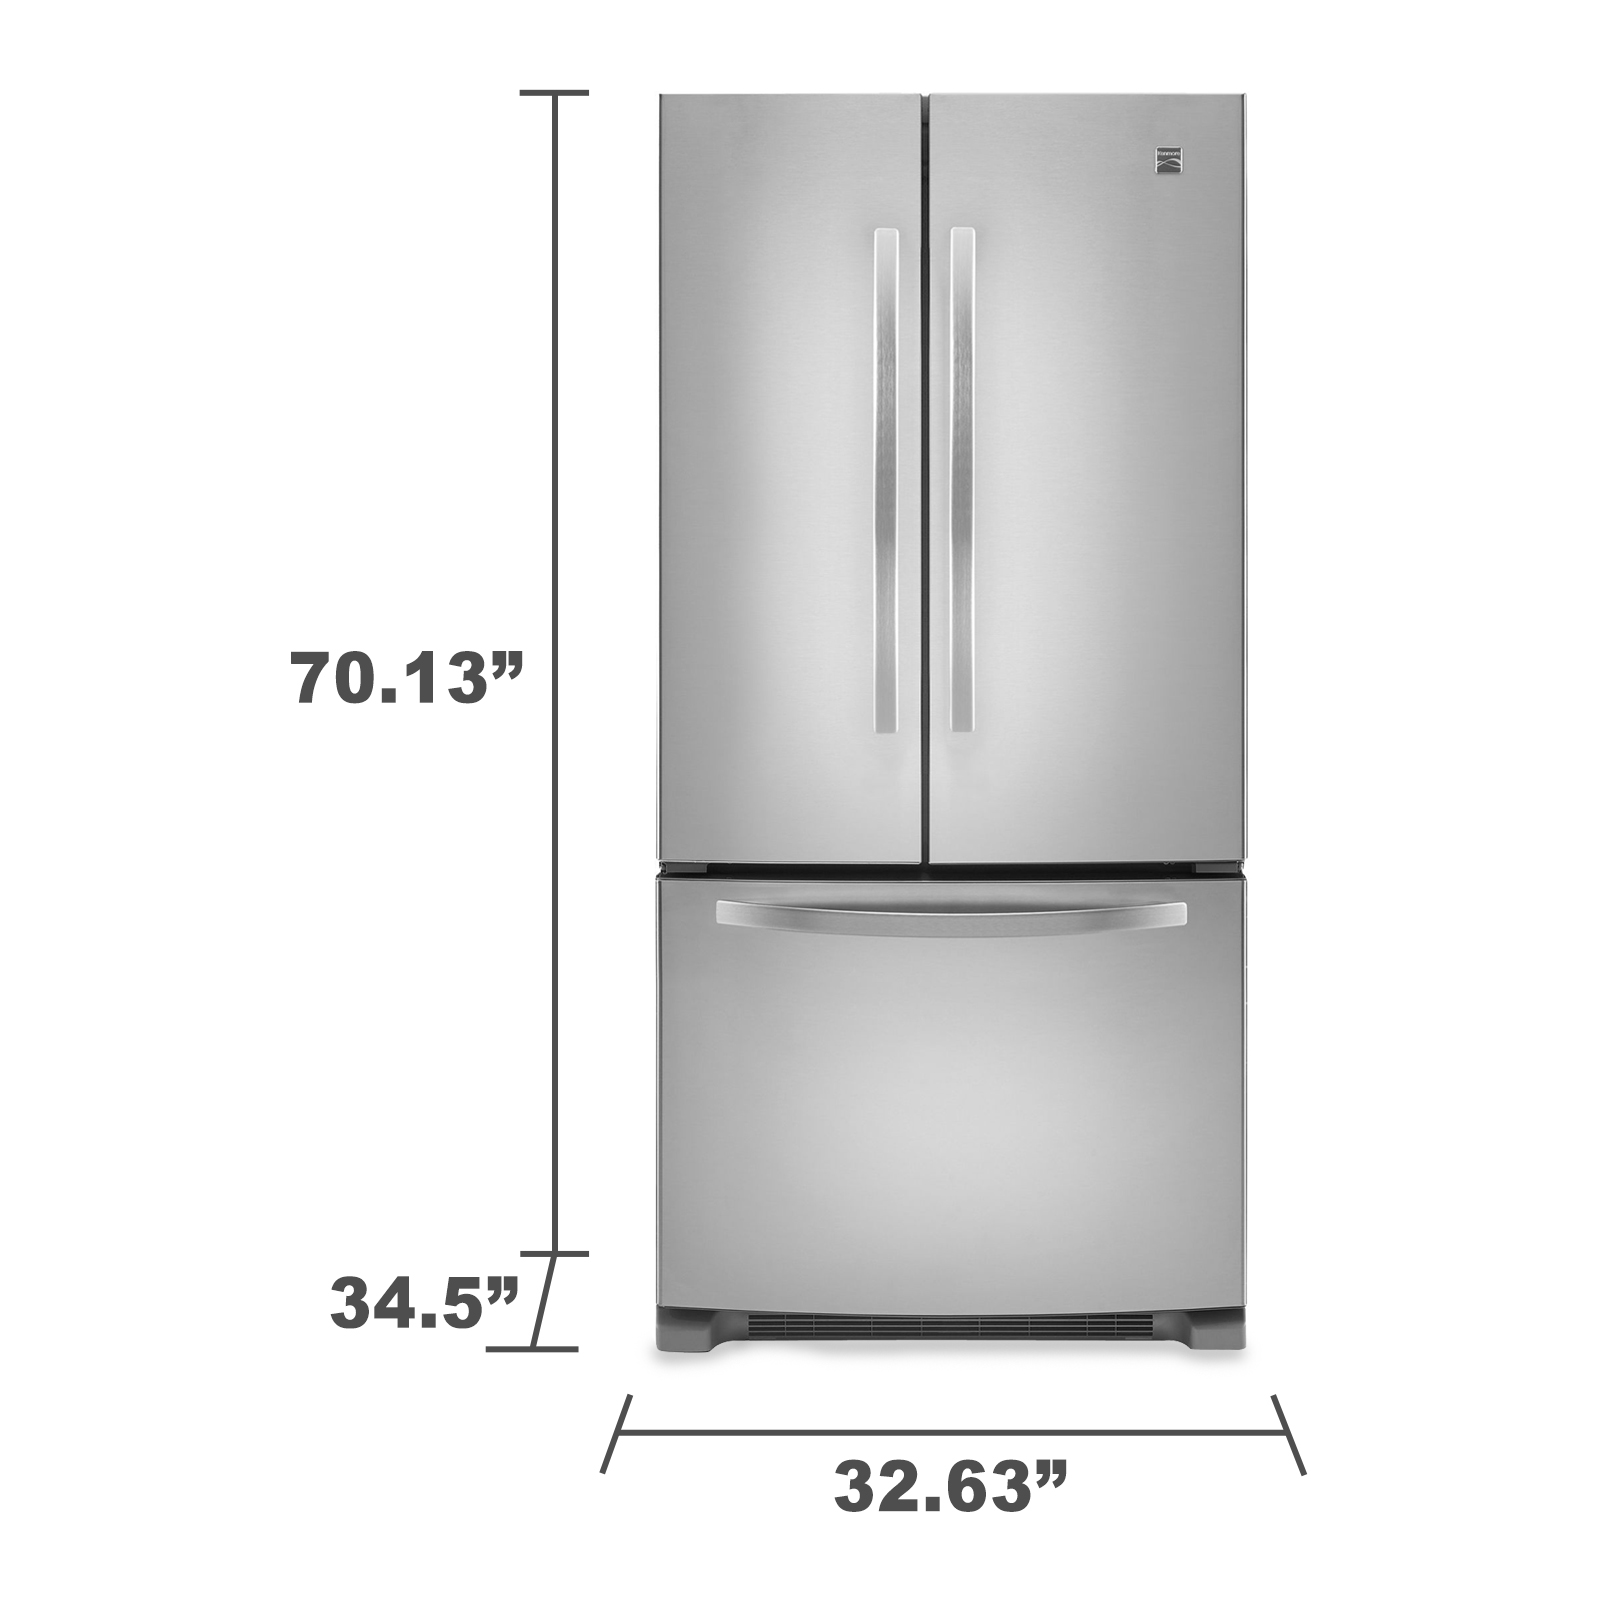 Kenmore 72003 22.1 cu. ft. French-Door Bottom-Freezer Refrigerator w/Internal Dispenser - Stainless Steel